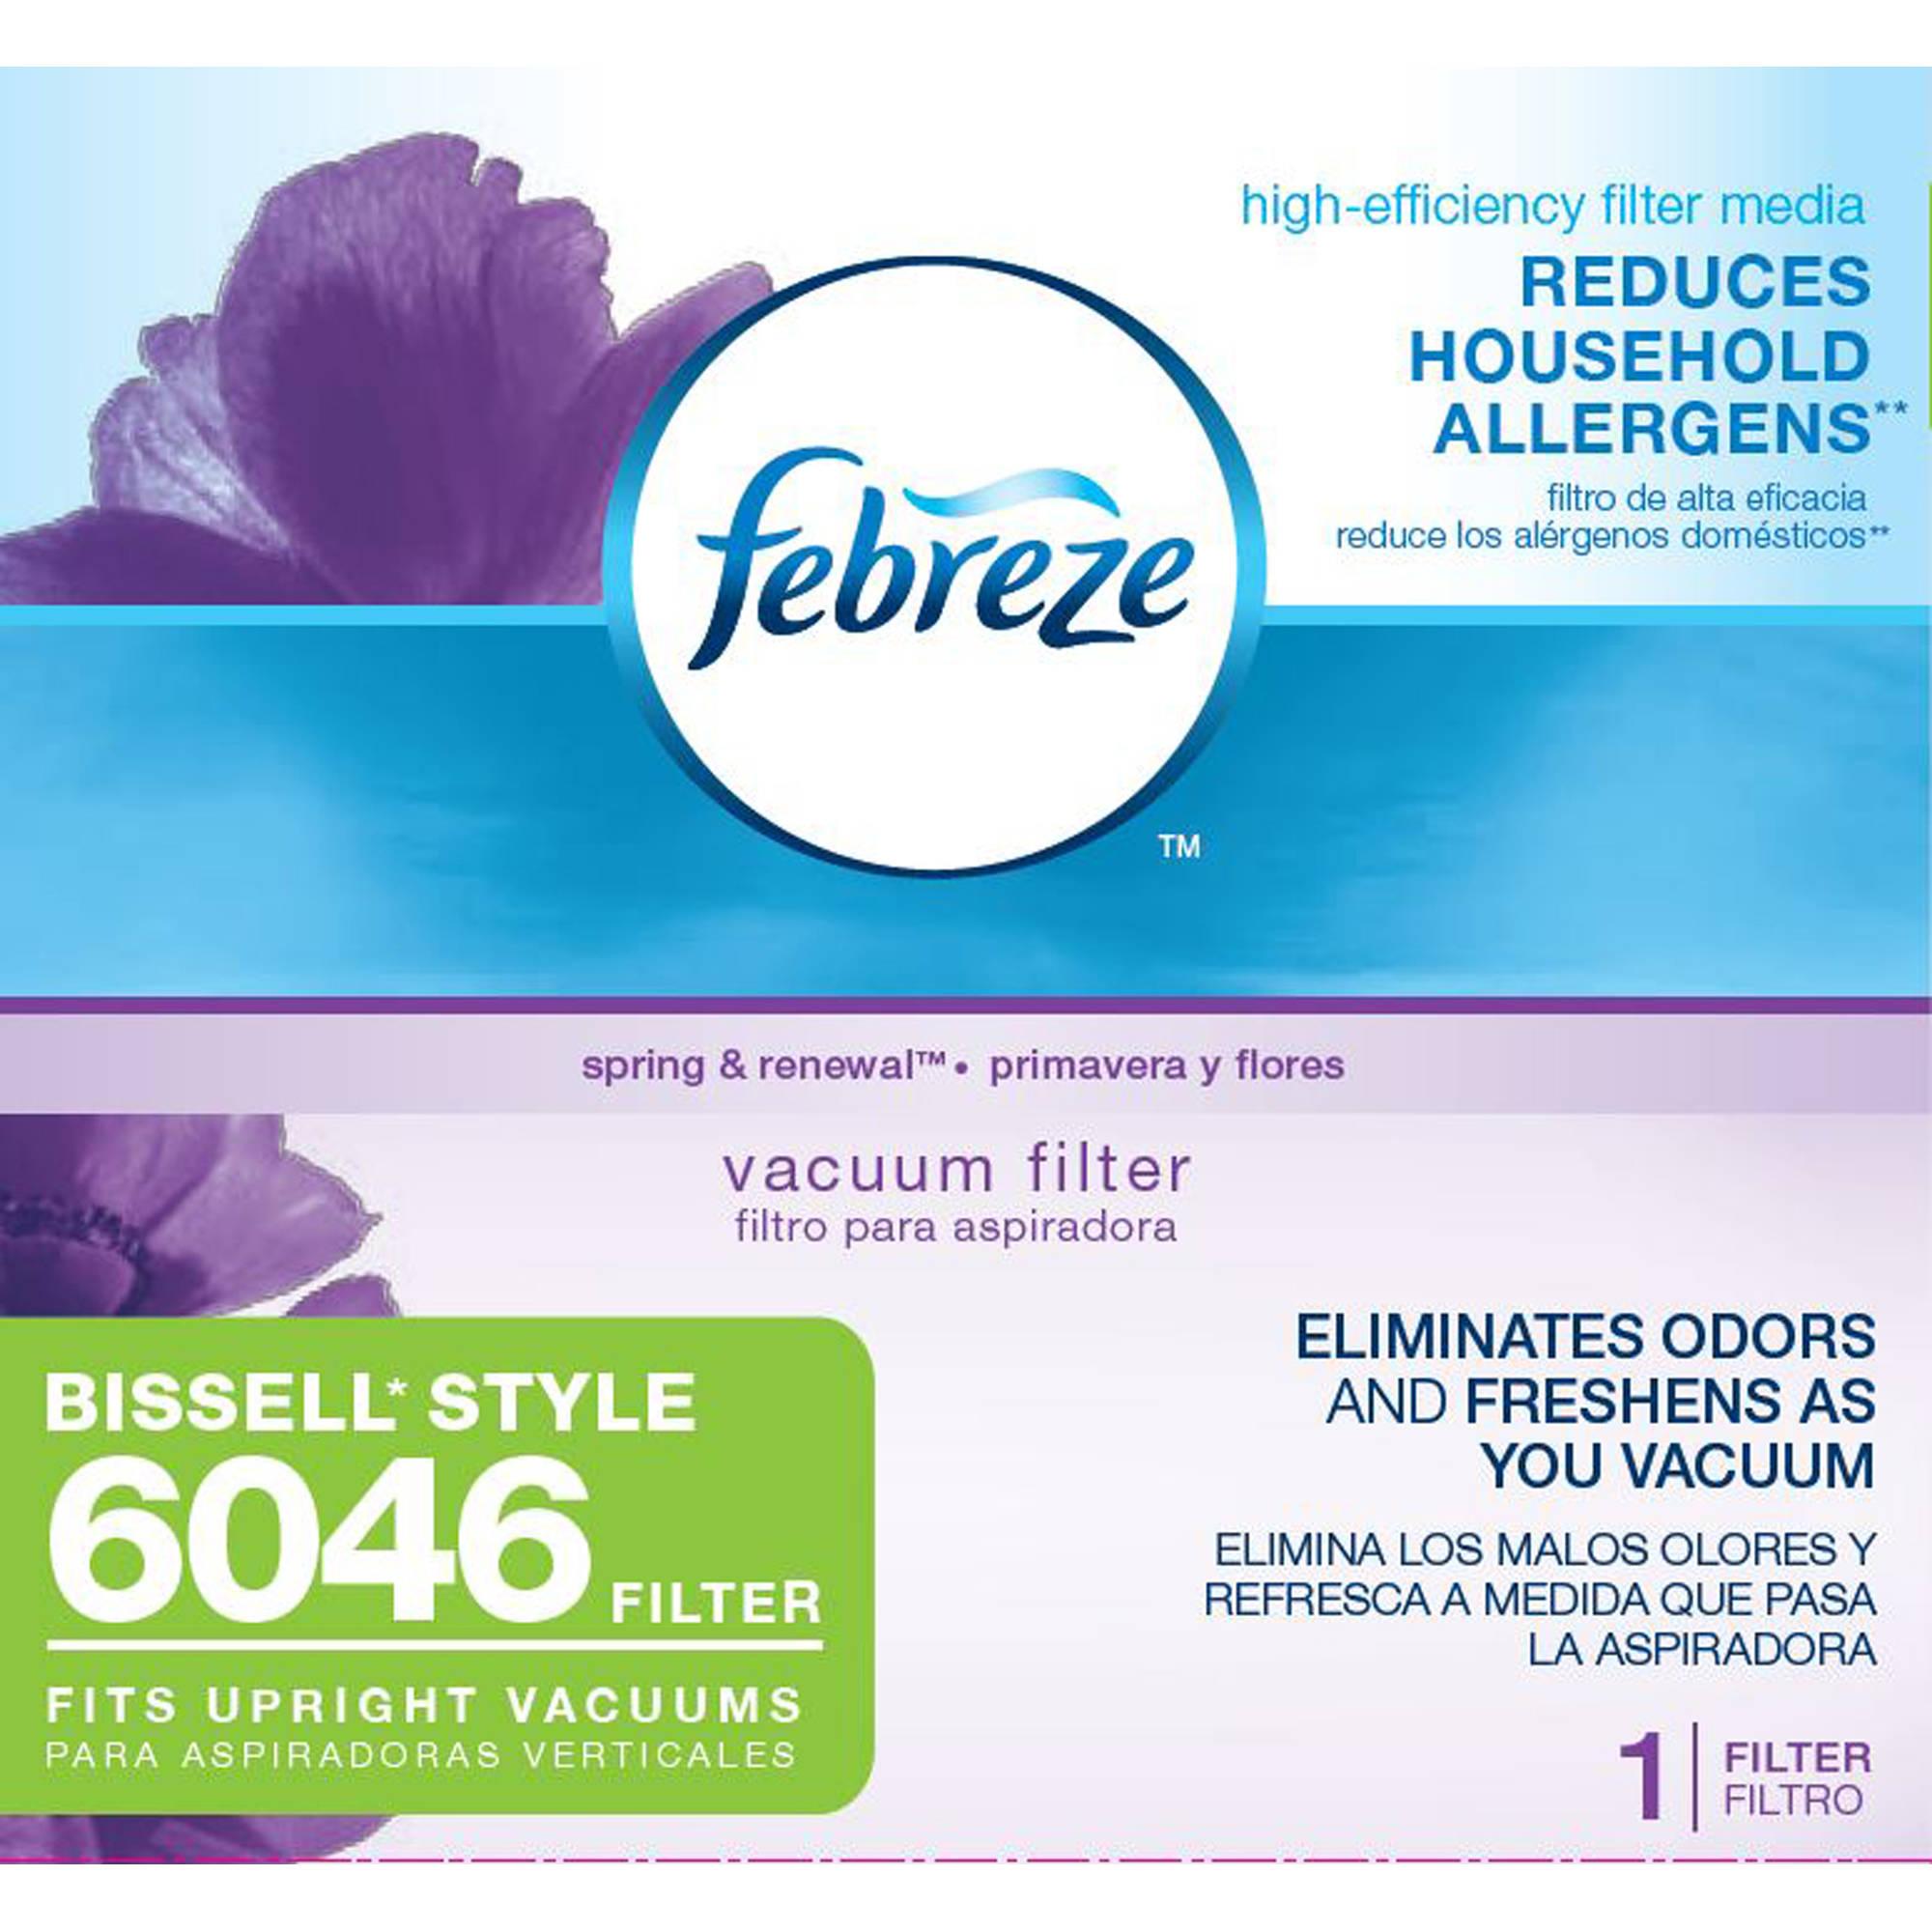 Febreze Bissell Filter, 6046 PDQ-60463